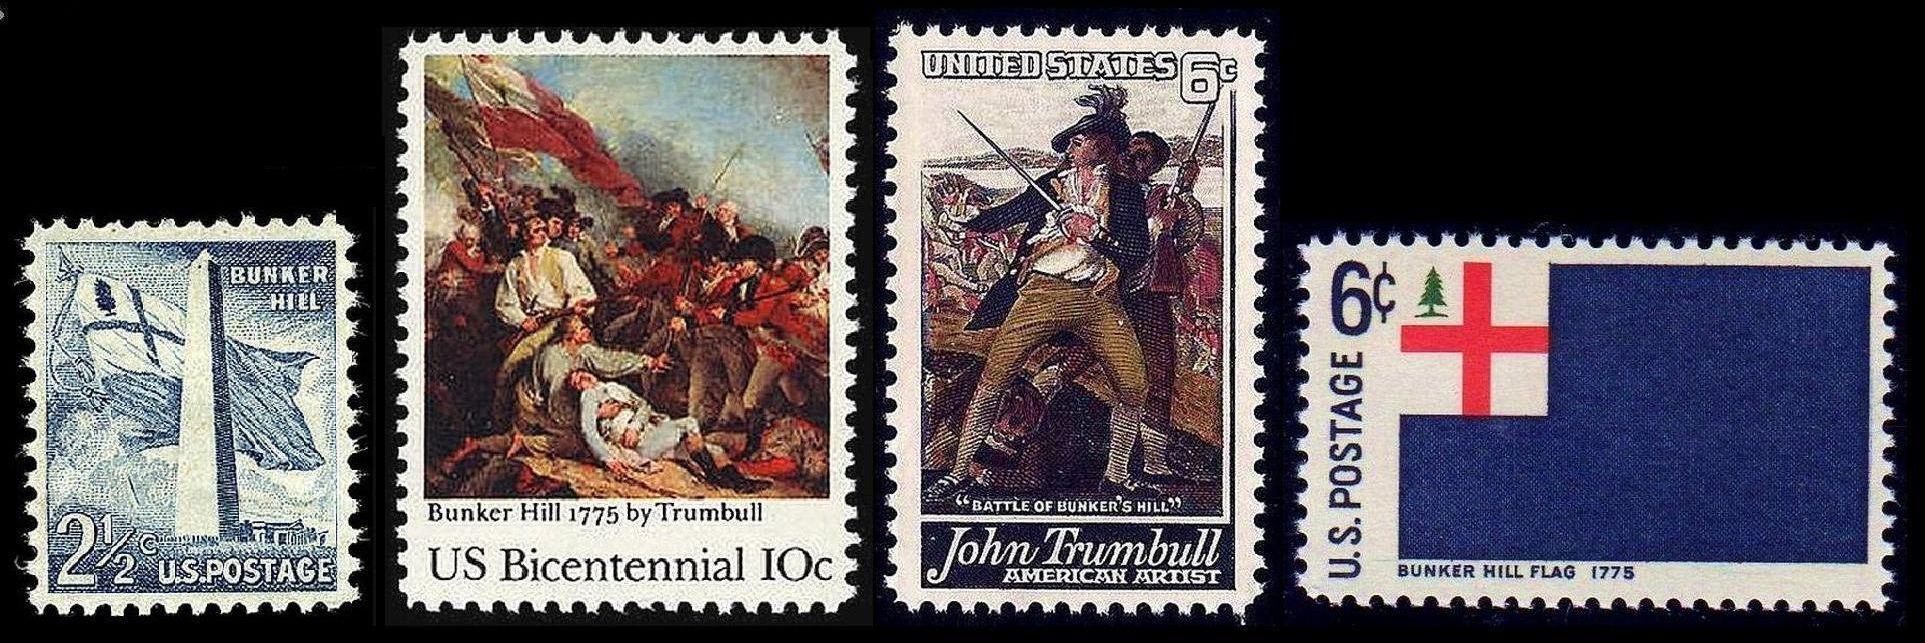 Wikipedia-sourced image portraying (left to right) United States Scott #1034 (1959), Scott #1564 (1975), Scott #1361 (1968) and Scott #1351 (1968).